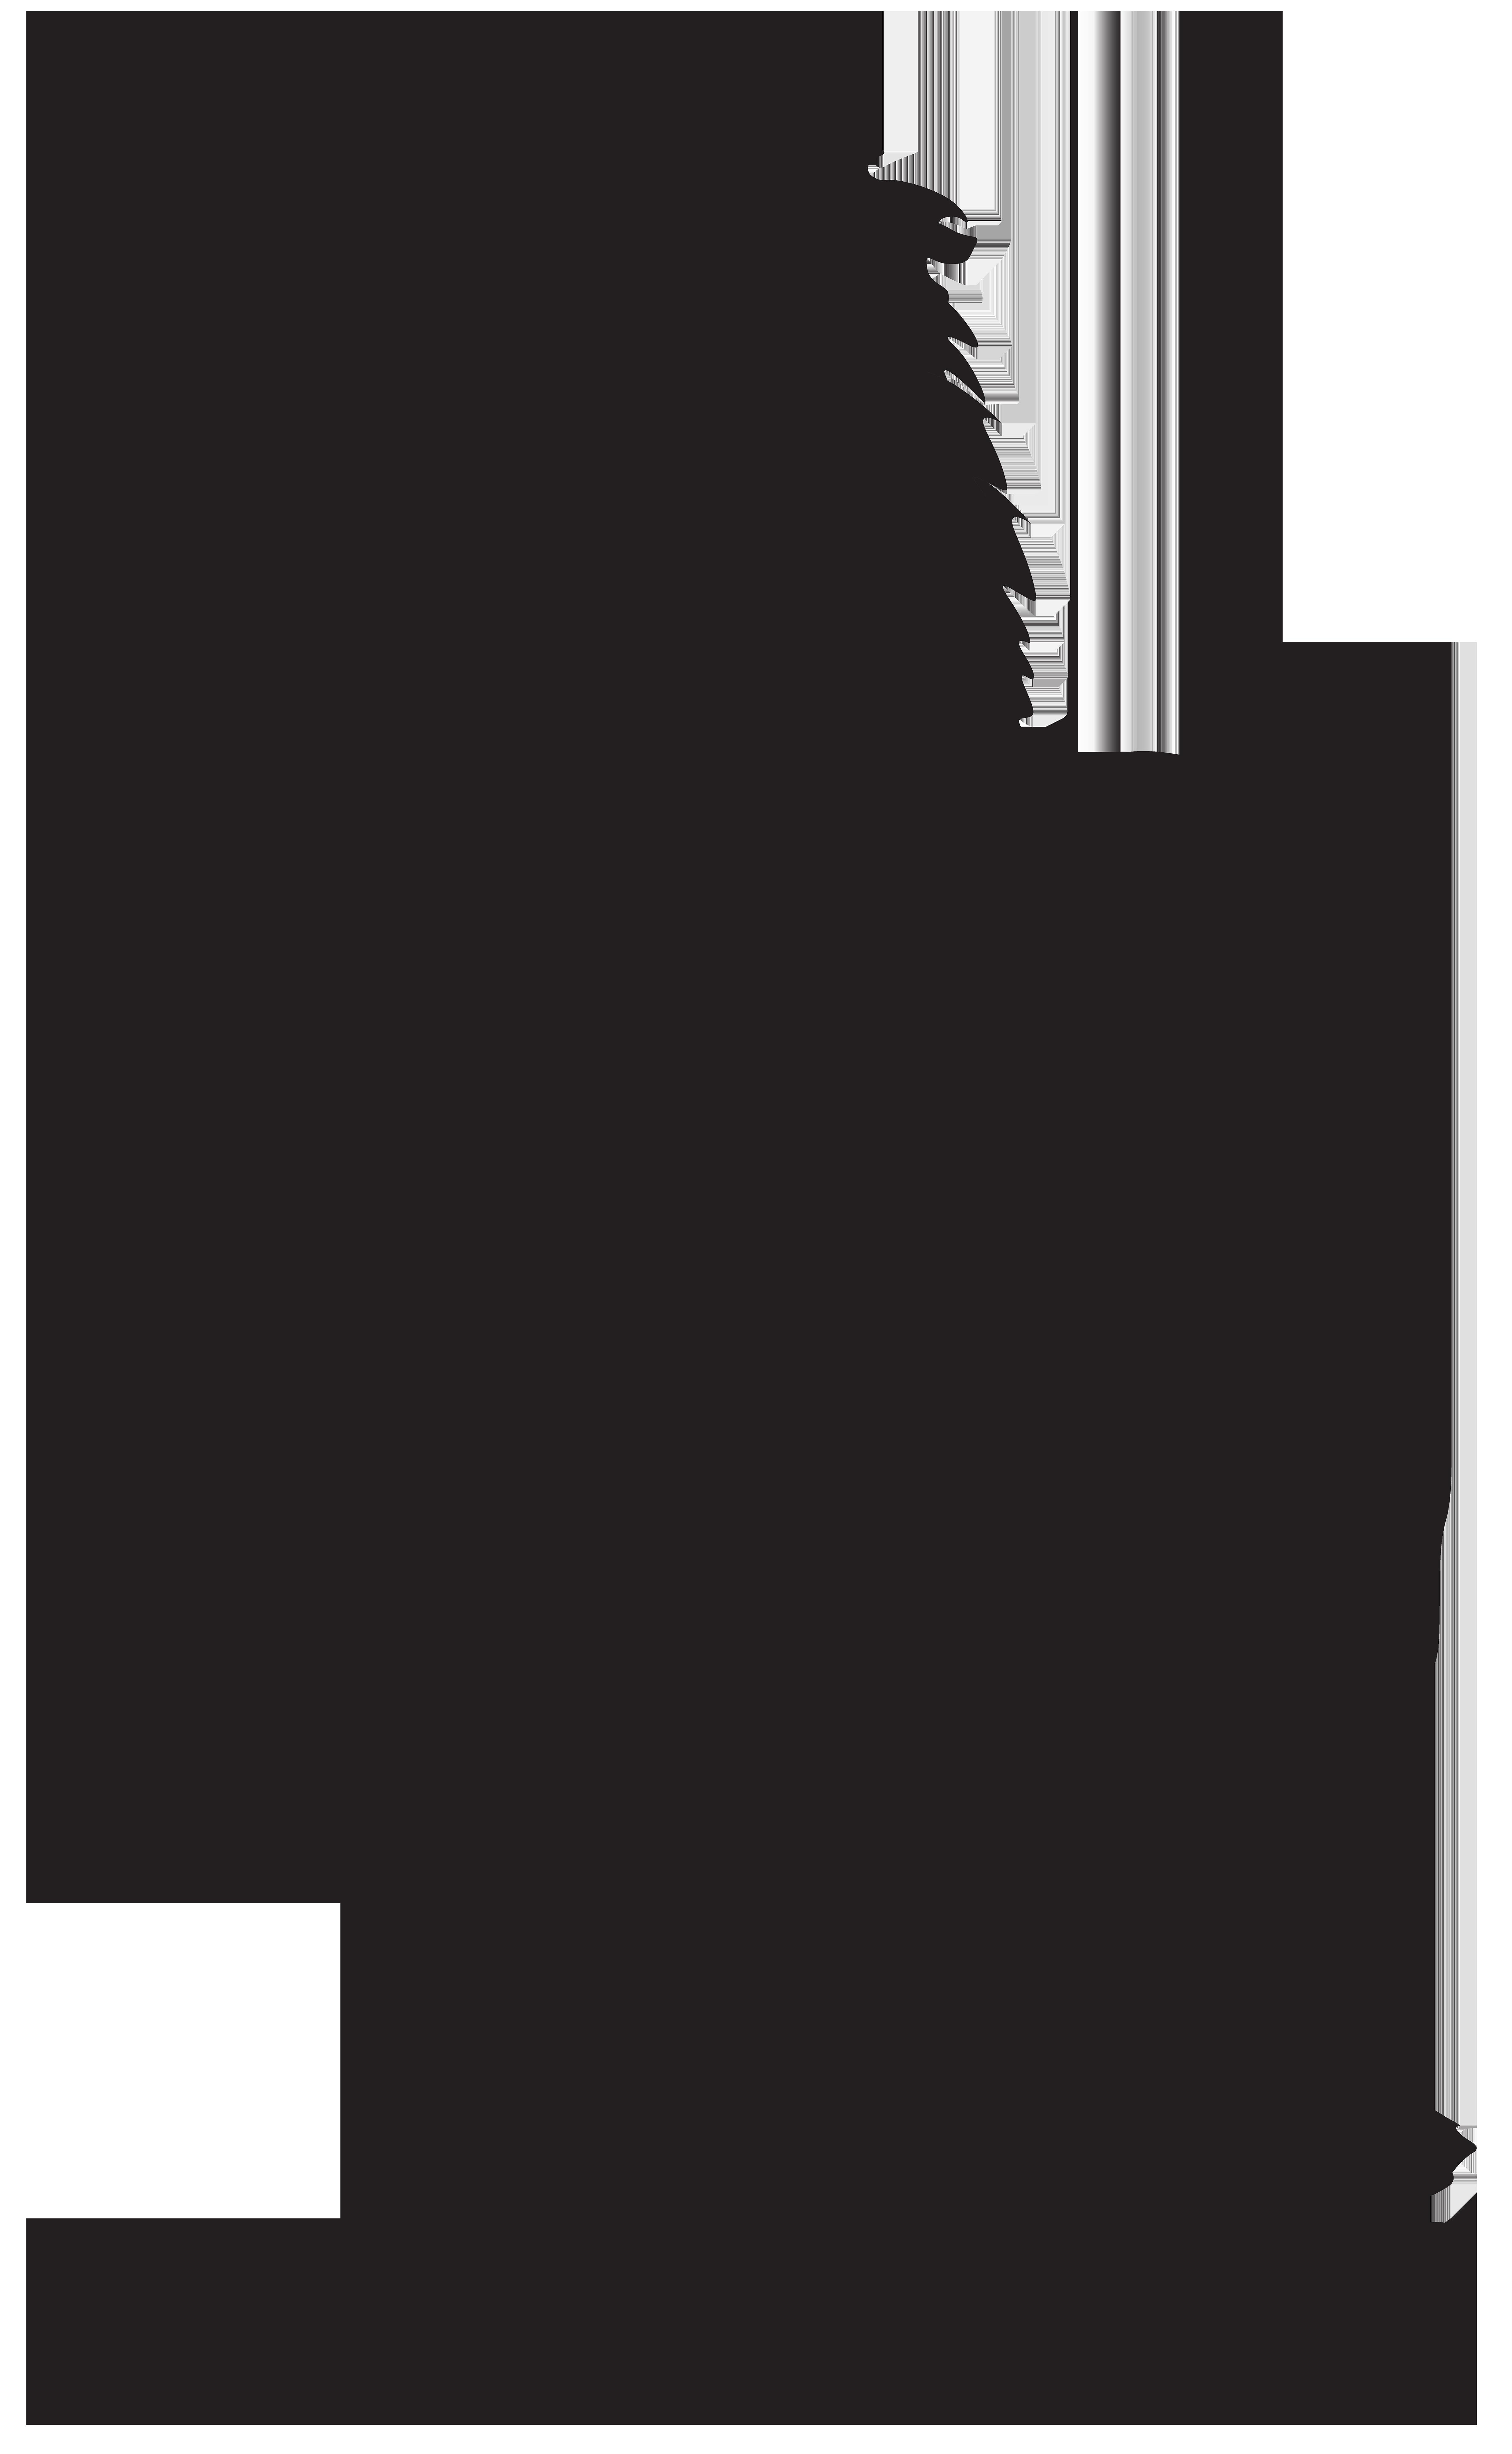 White lion Silhouette Clip art.